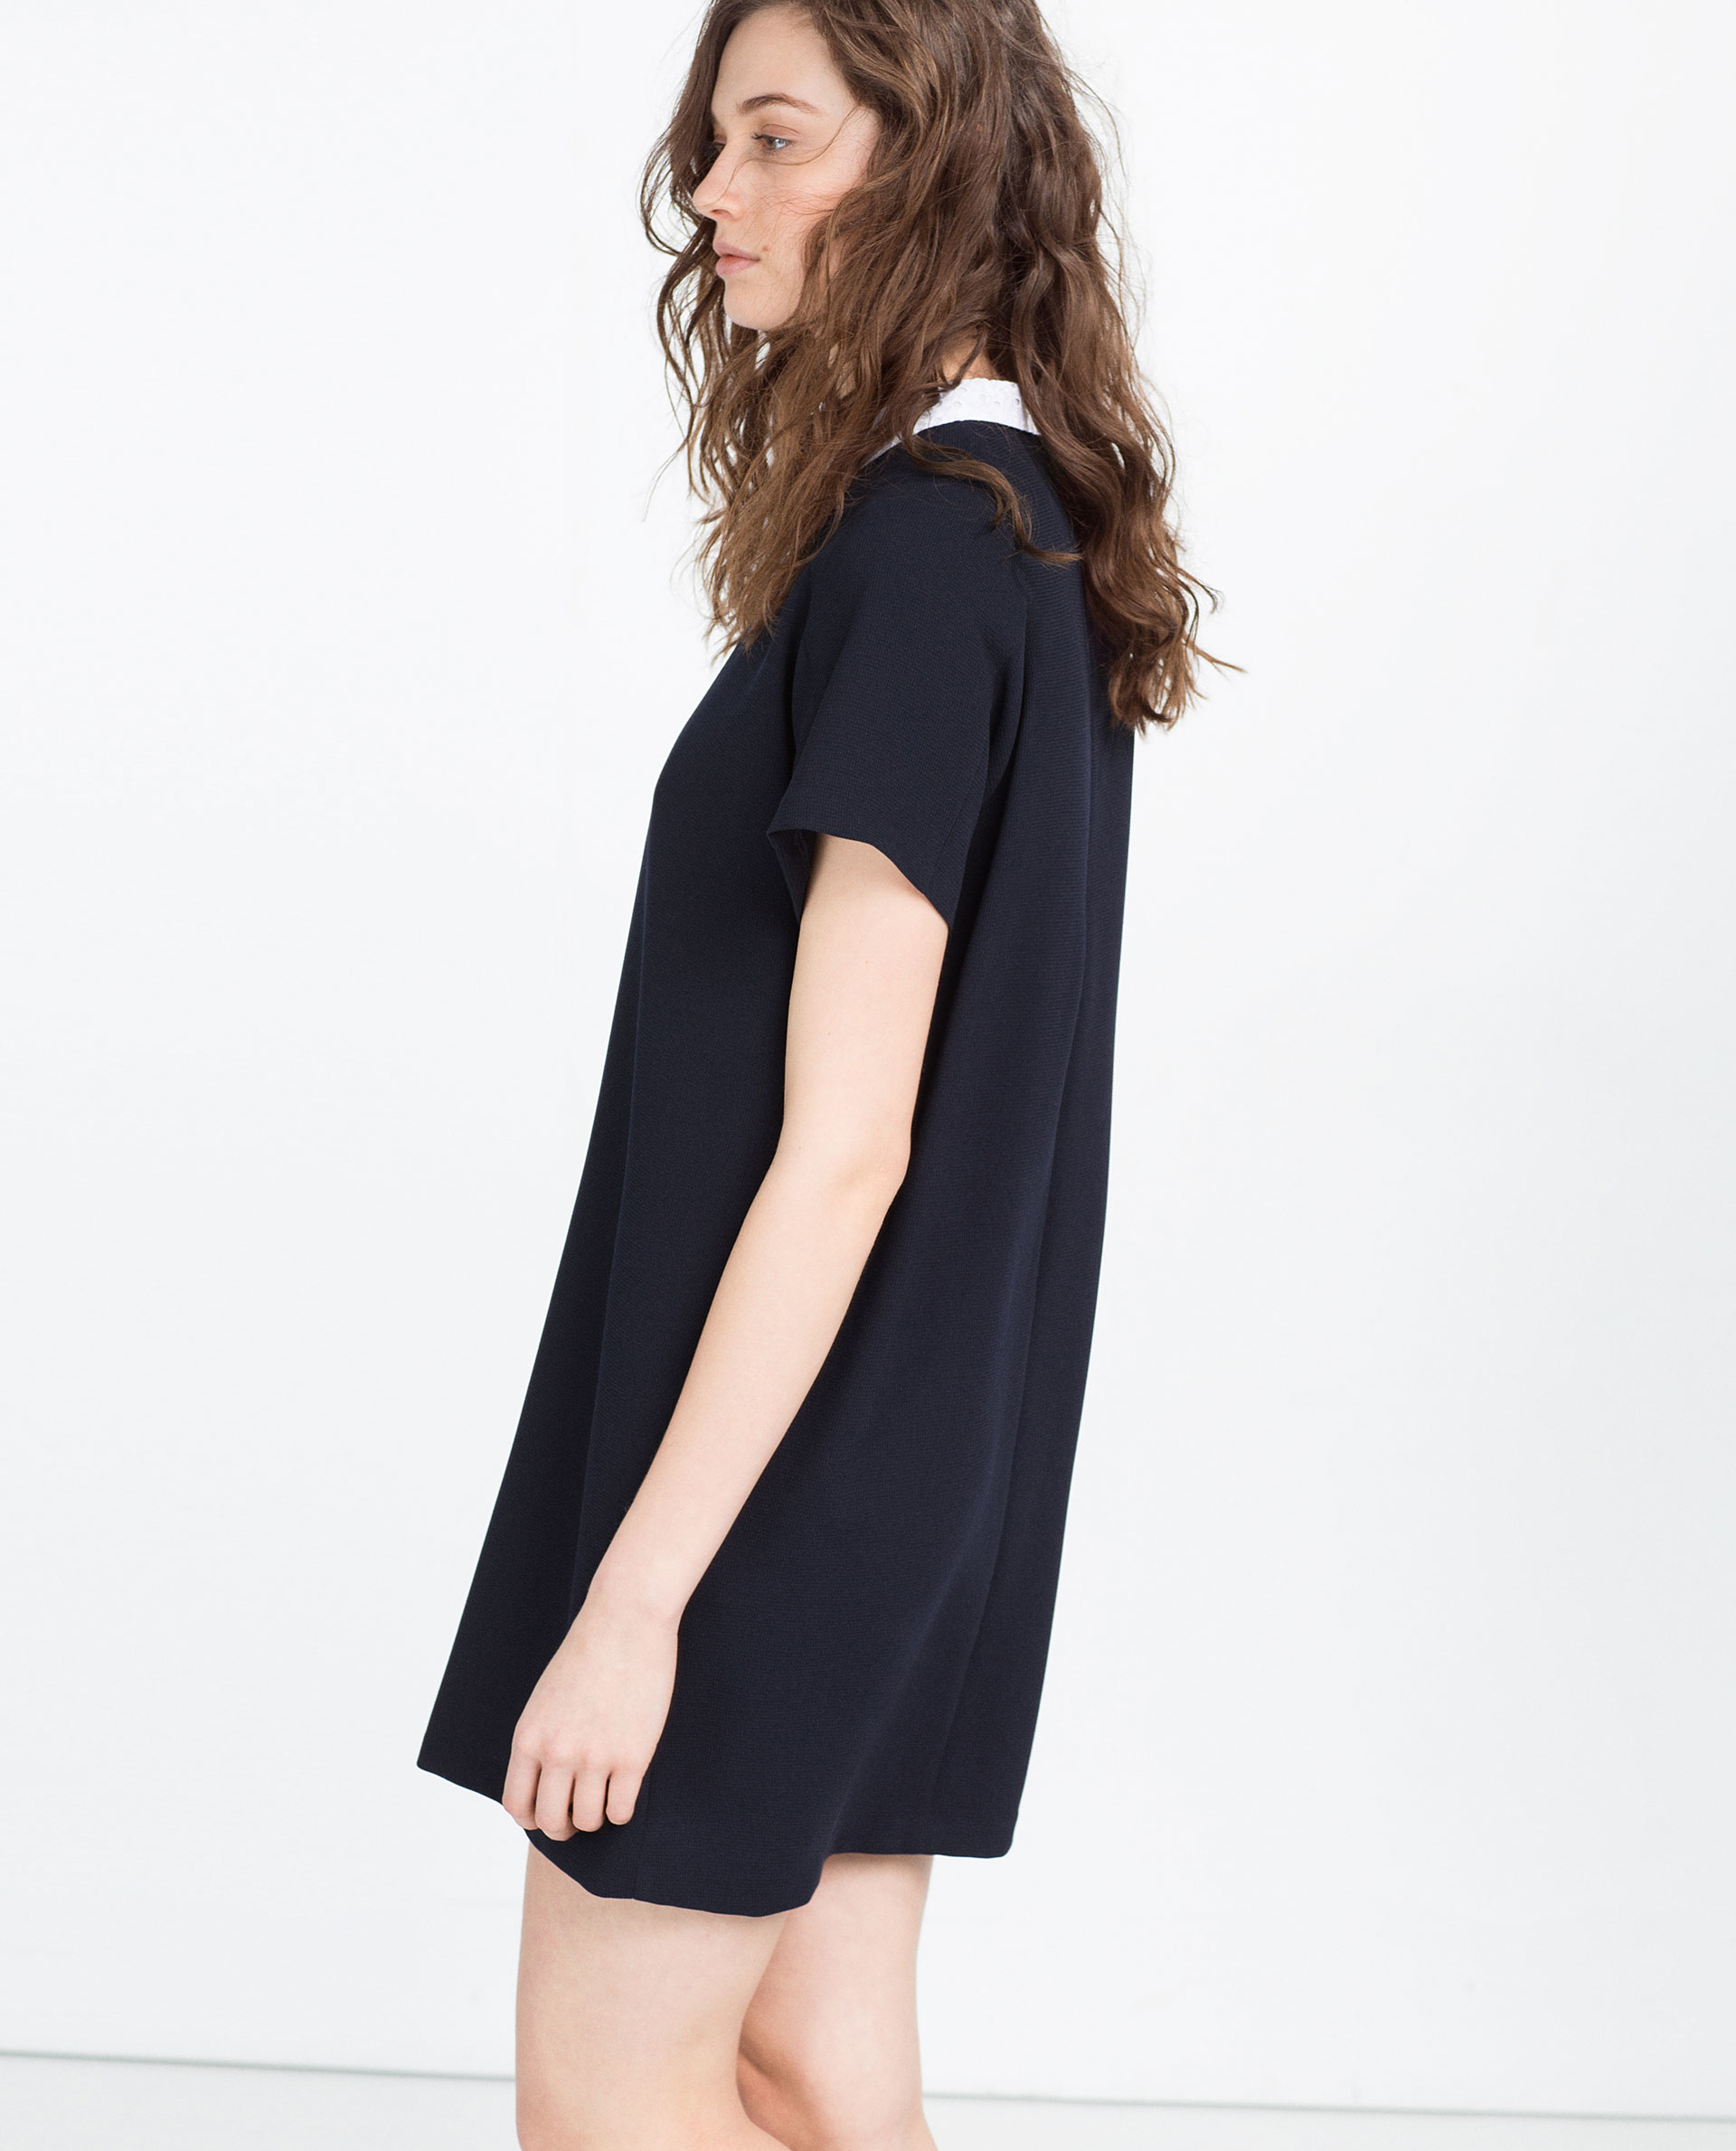 Zara Straight Cut Dress With Collar In Black Lyst